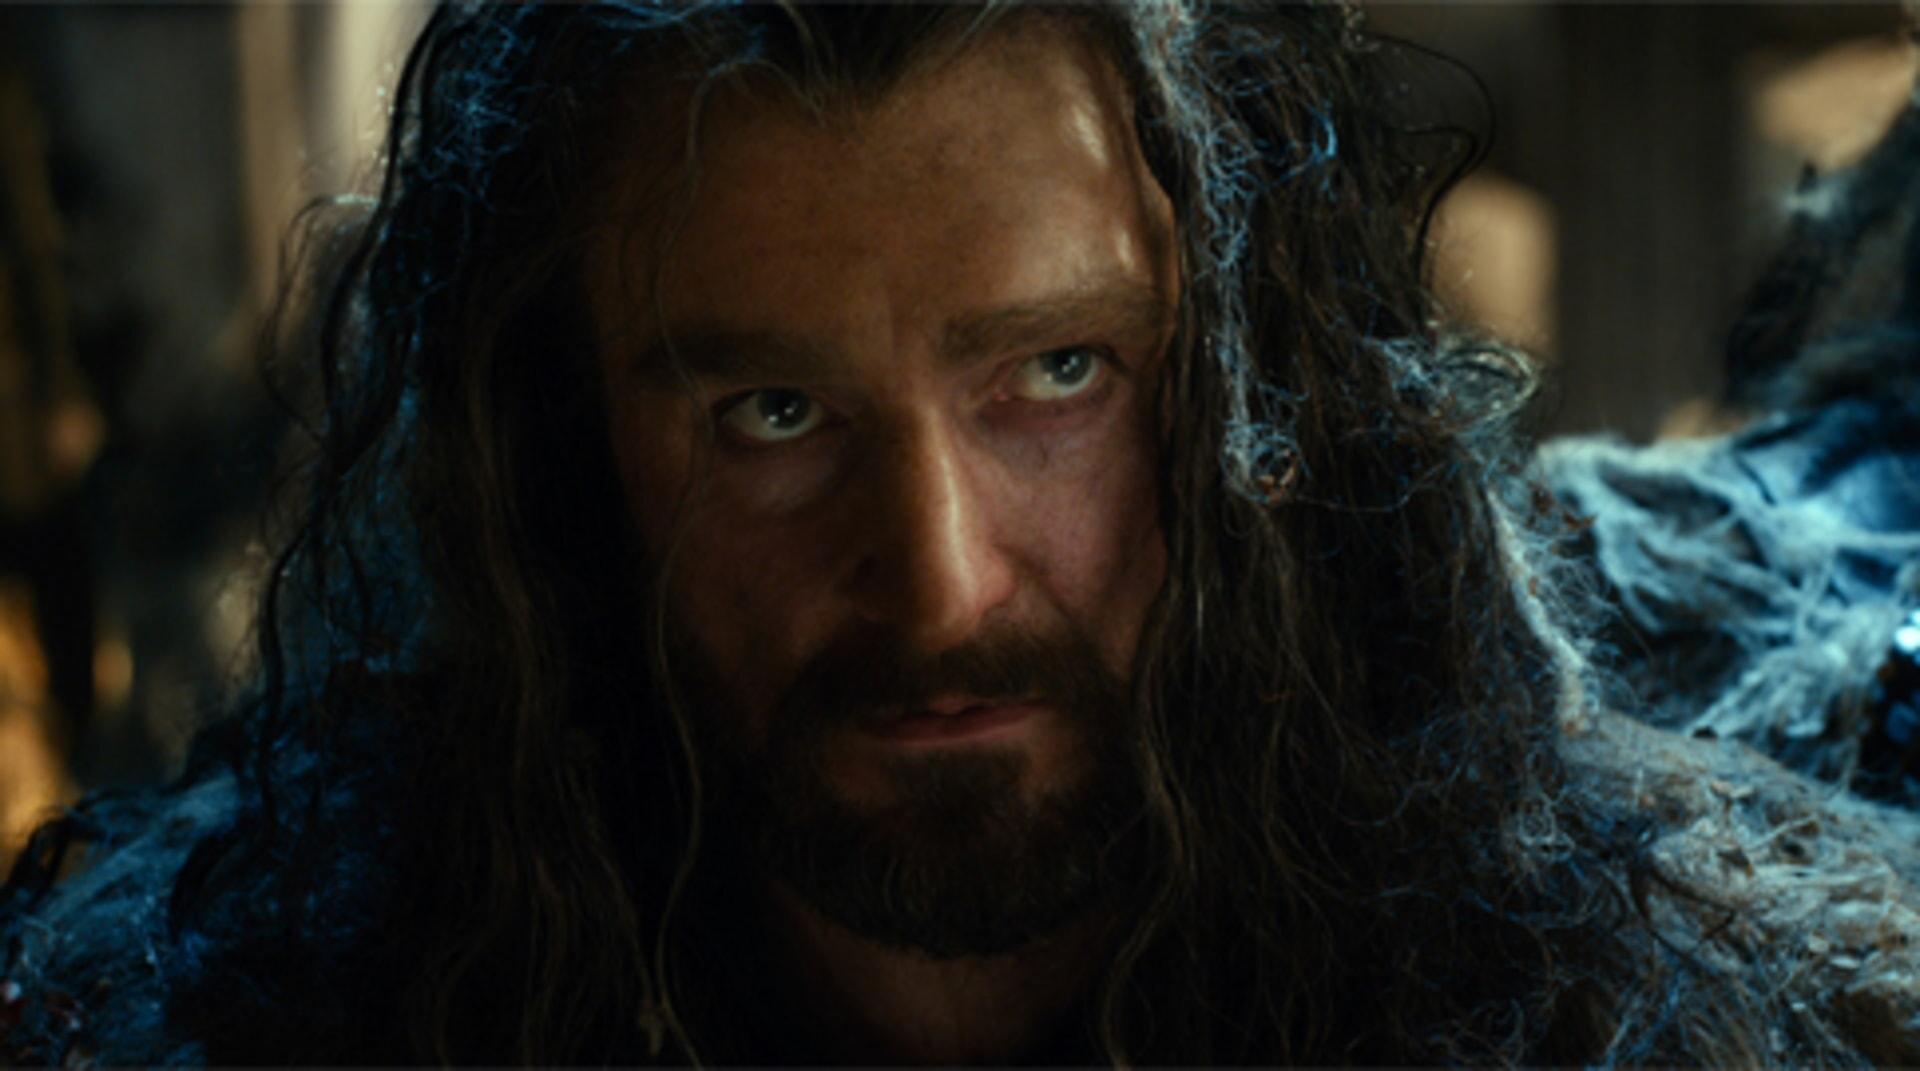 The Hobbit: The Desolation of Smaug - Image 36